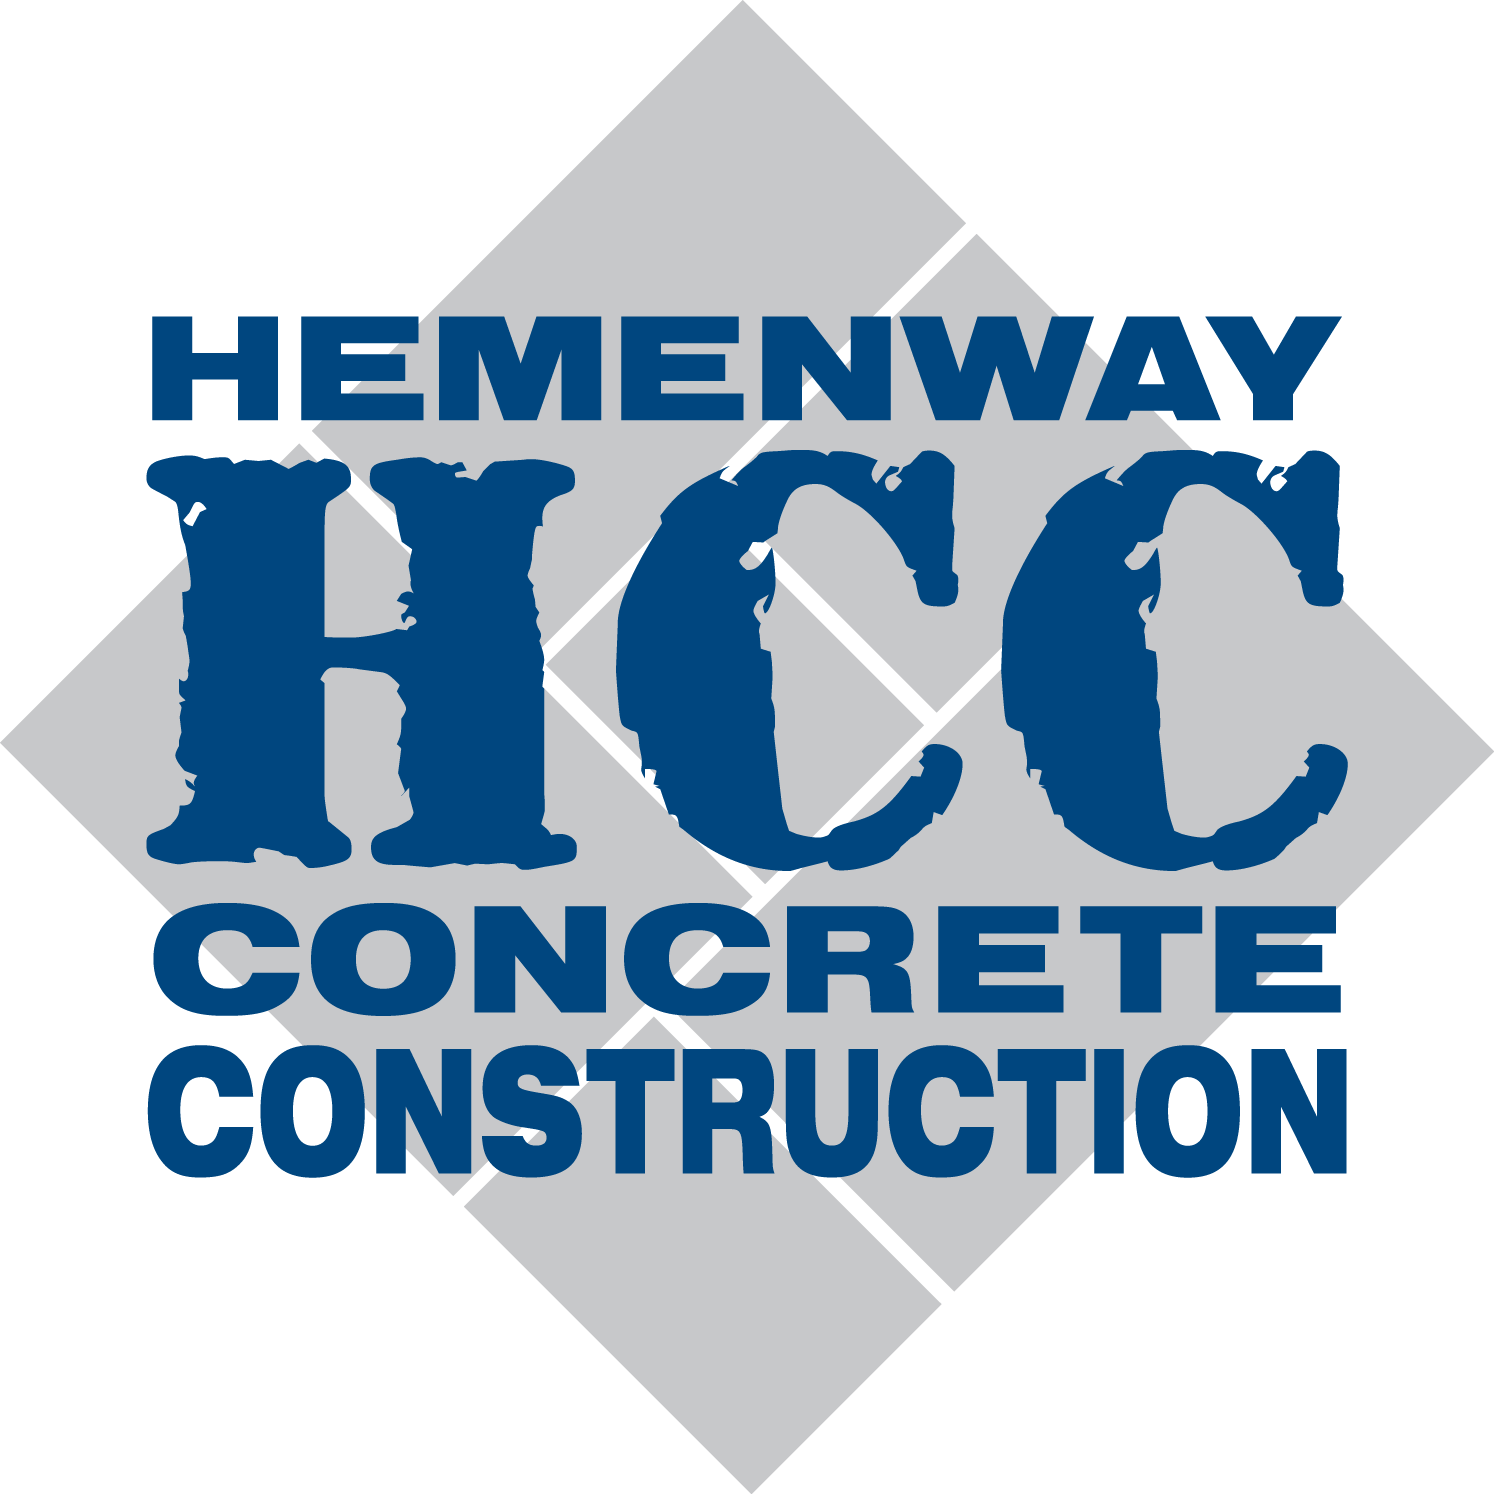 HEMENWAY CONCRETE CONTRACTING INC